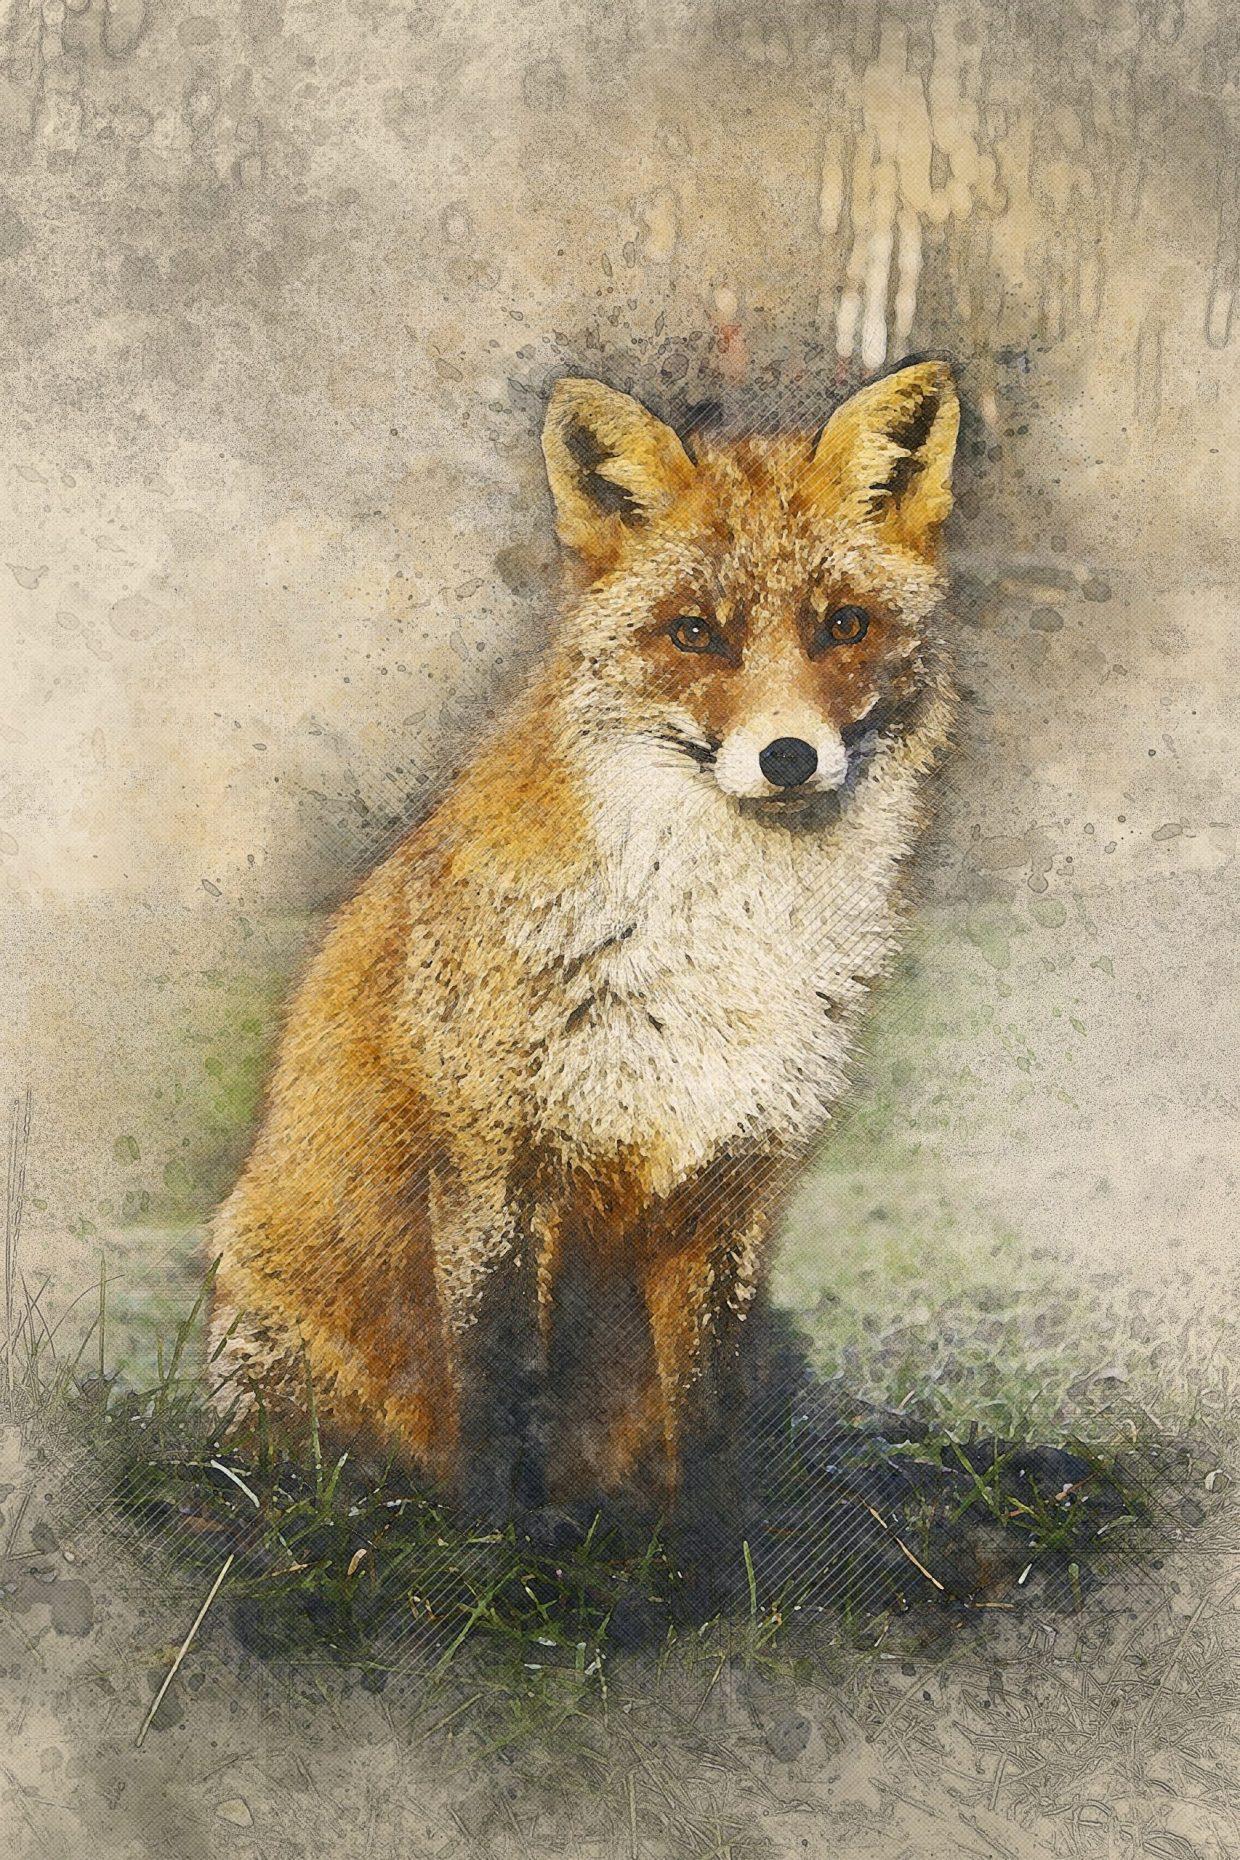 Mr. Fox Felt Really Bad - Saint Kieran (Ciaran) of Saighir song image